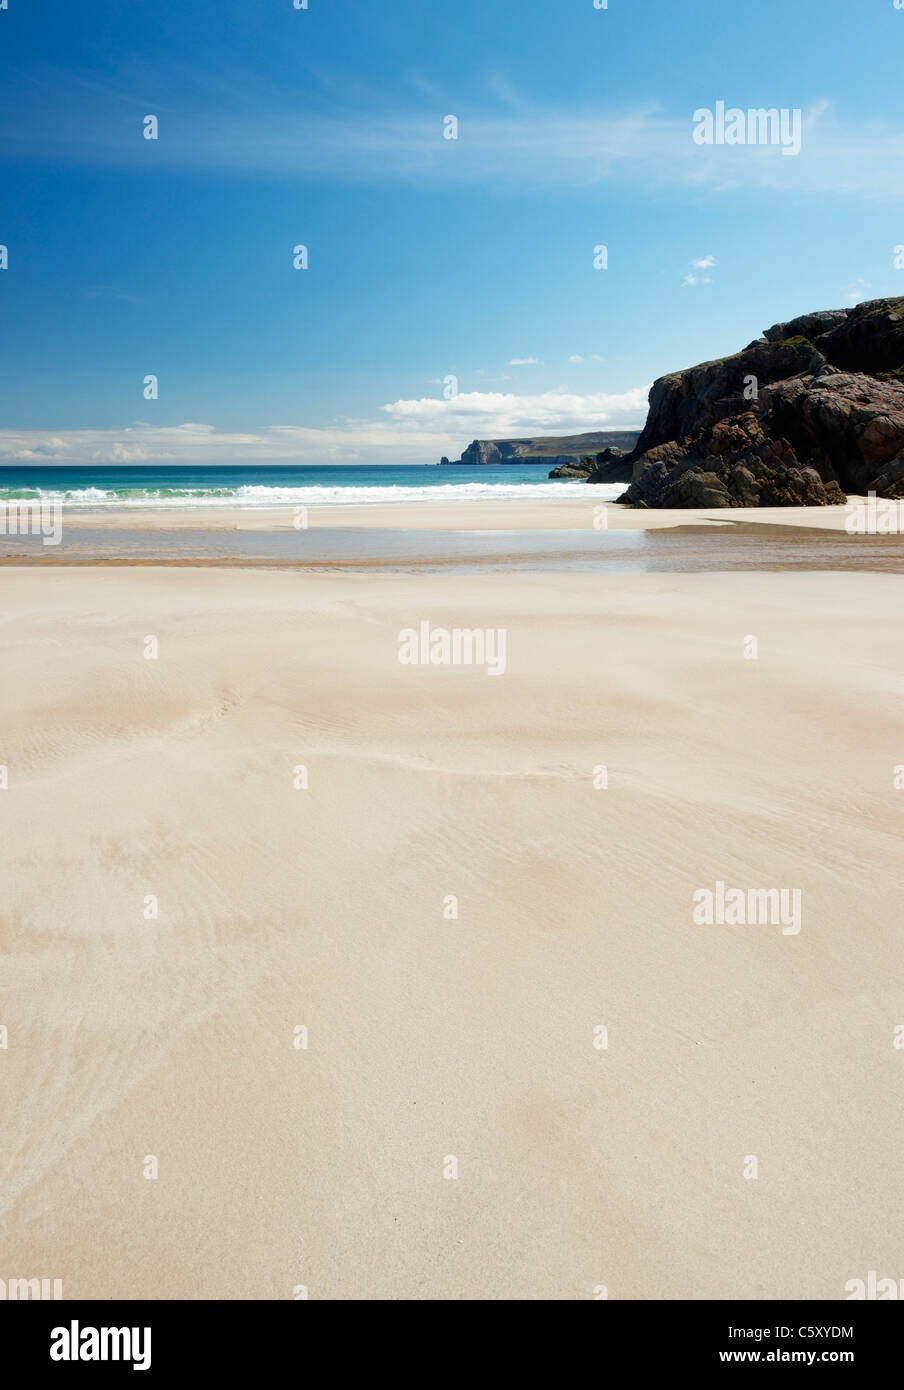 Traigh Allt Chailgeag, a beach near Durness, Sutherland, Highland, Scotland, UK. - Stock Image